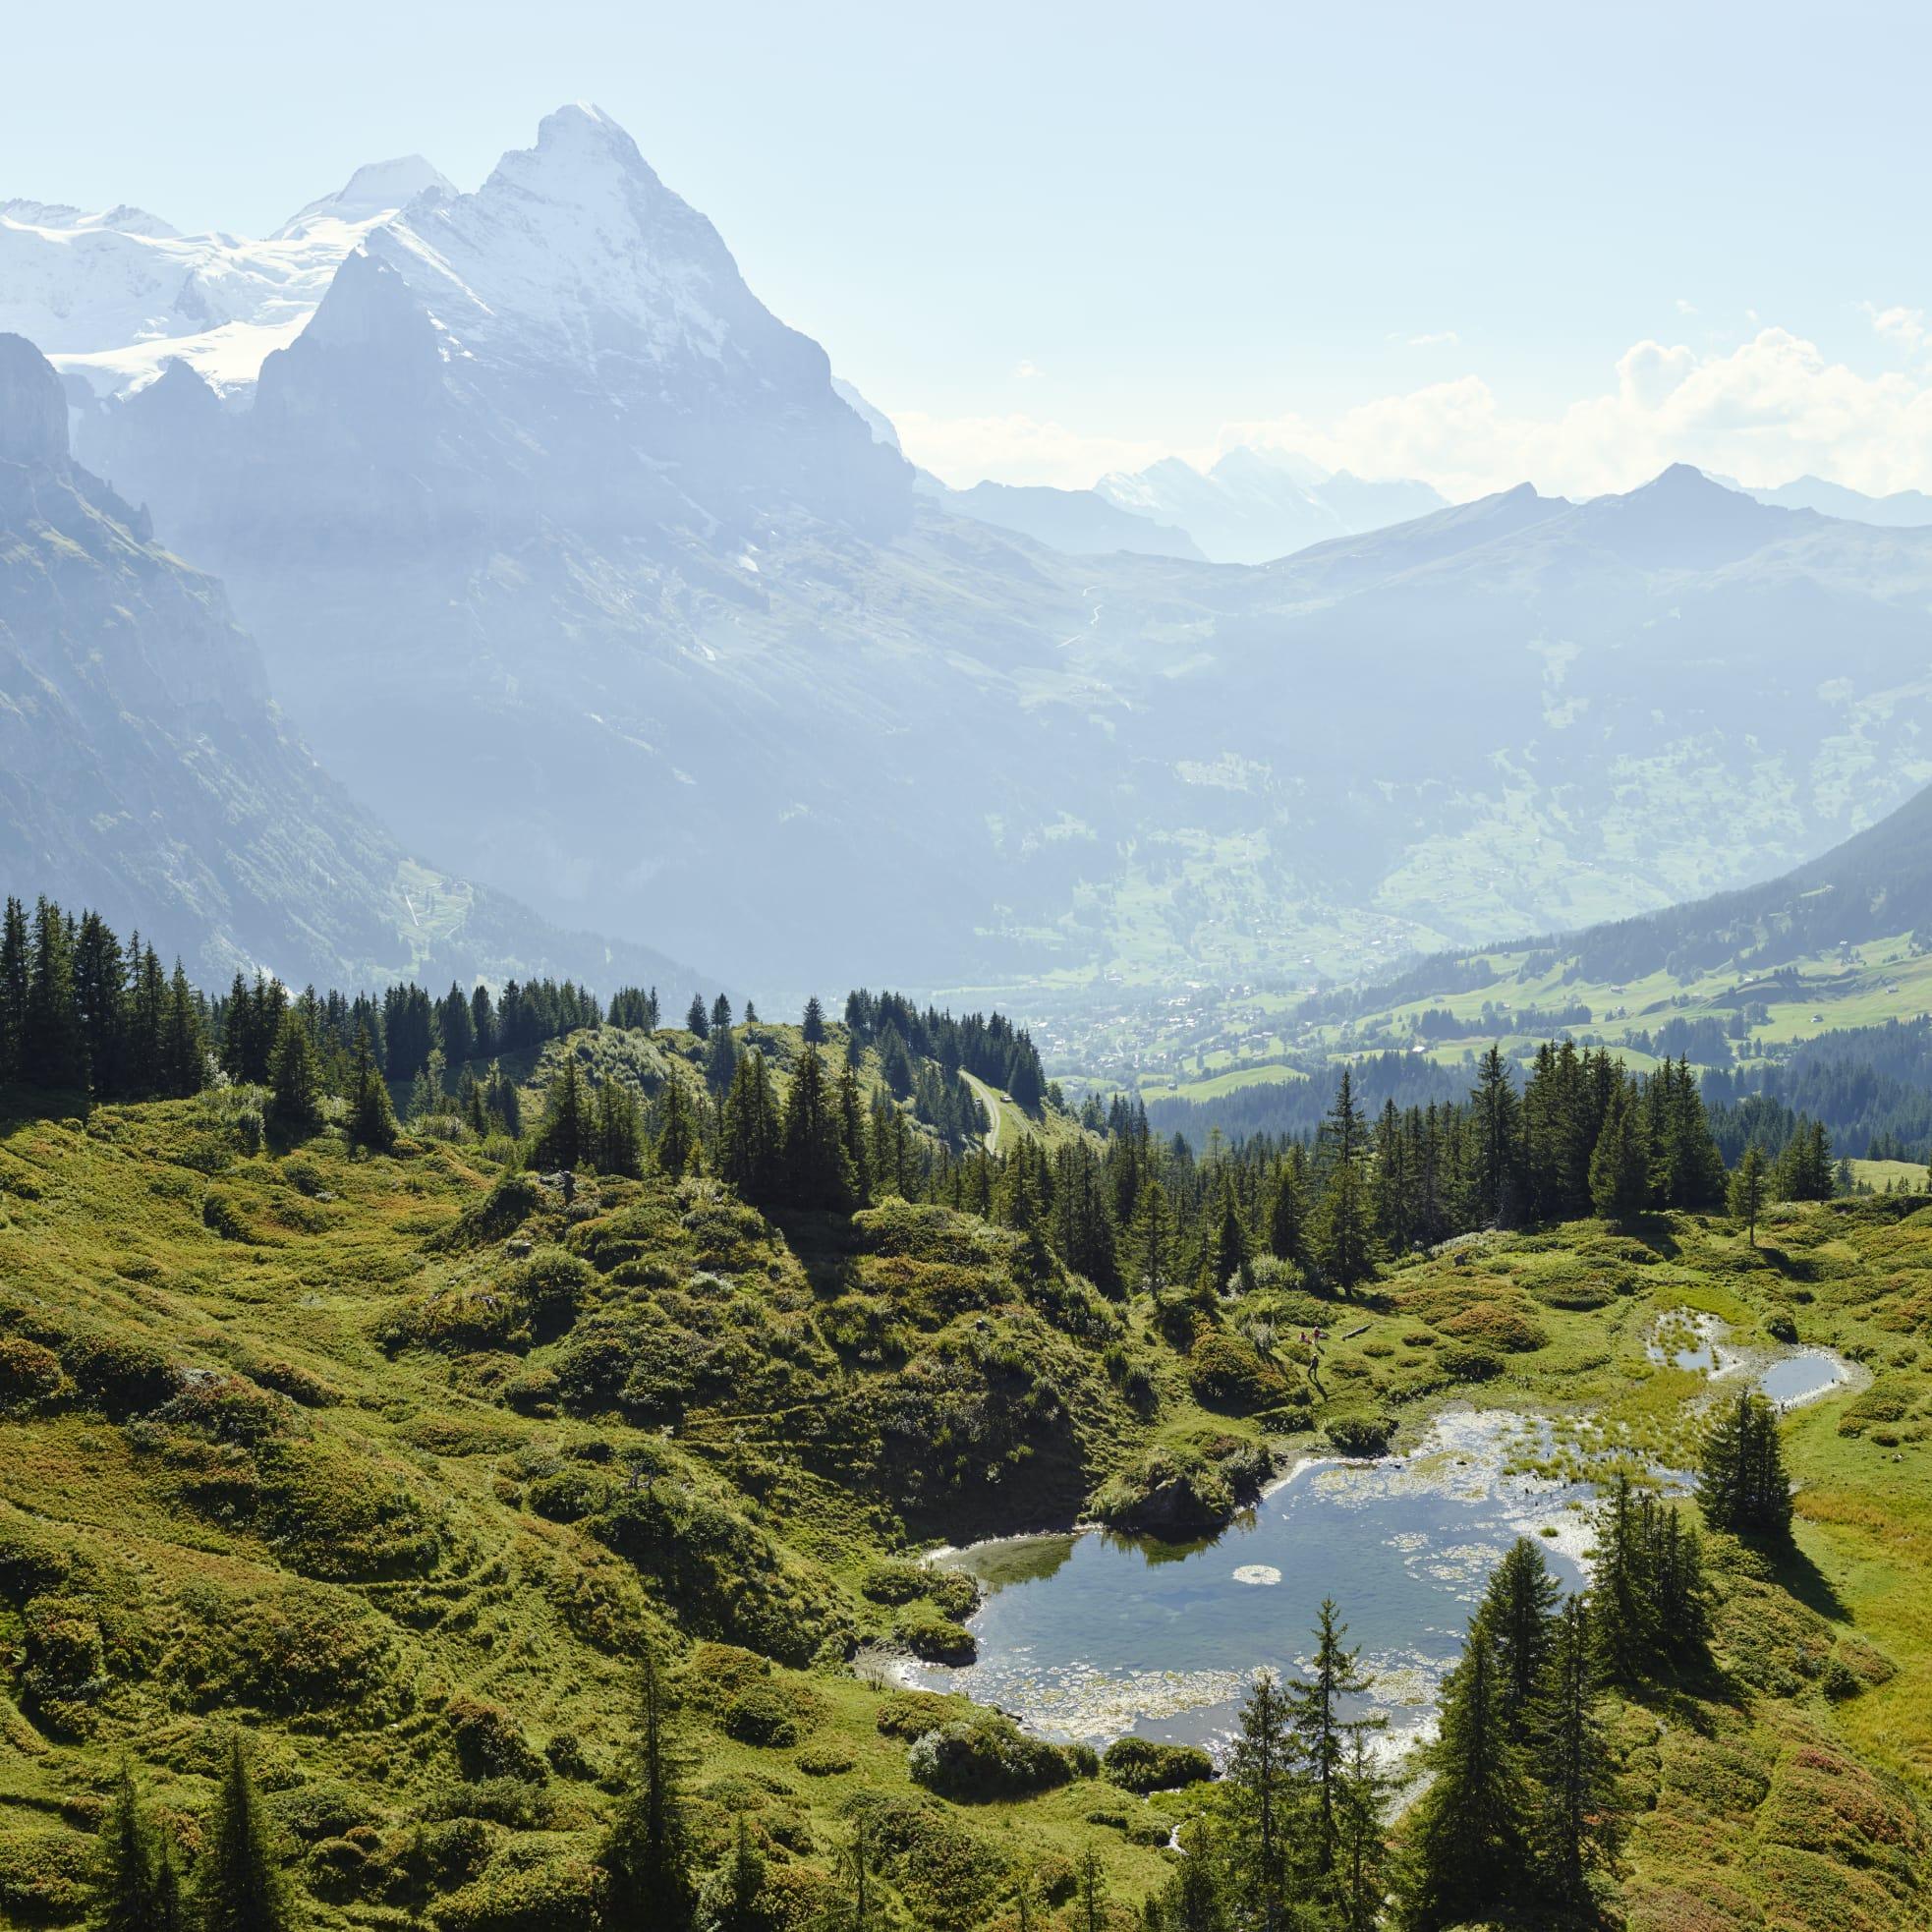 Antseeuwen Chlosterseeli Panorama Berner Oberland Sommer